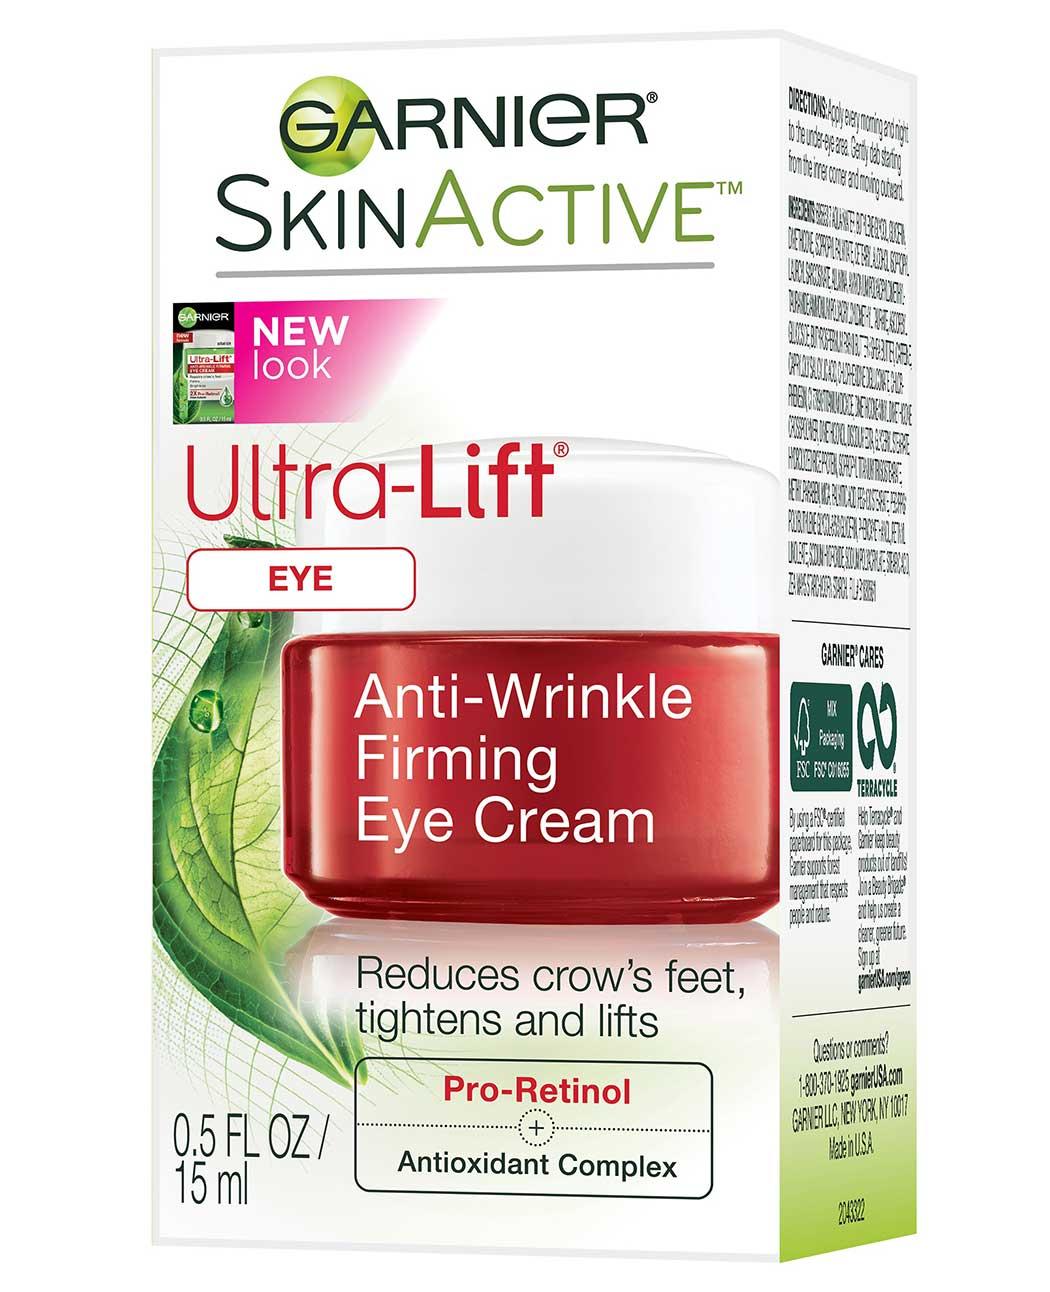 Garnier Skinactive Ultra Lift Anti Wrinkle Firming Eye Cream Buy In Bangladesh Eye Creams Treatments